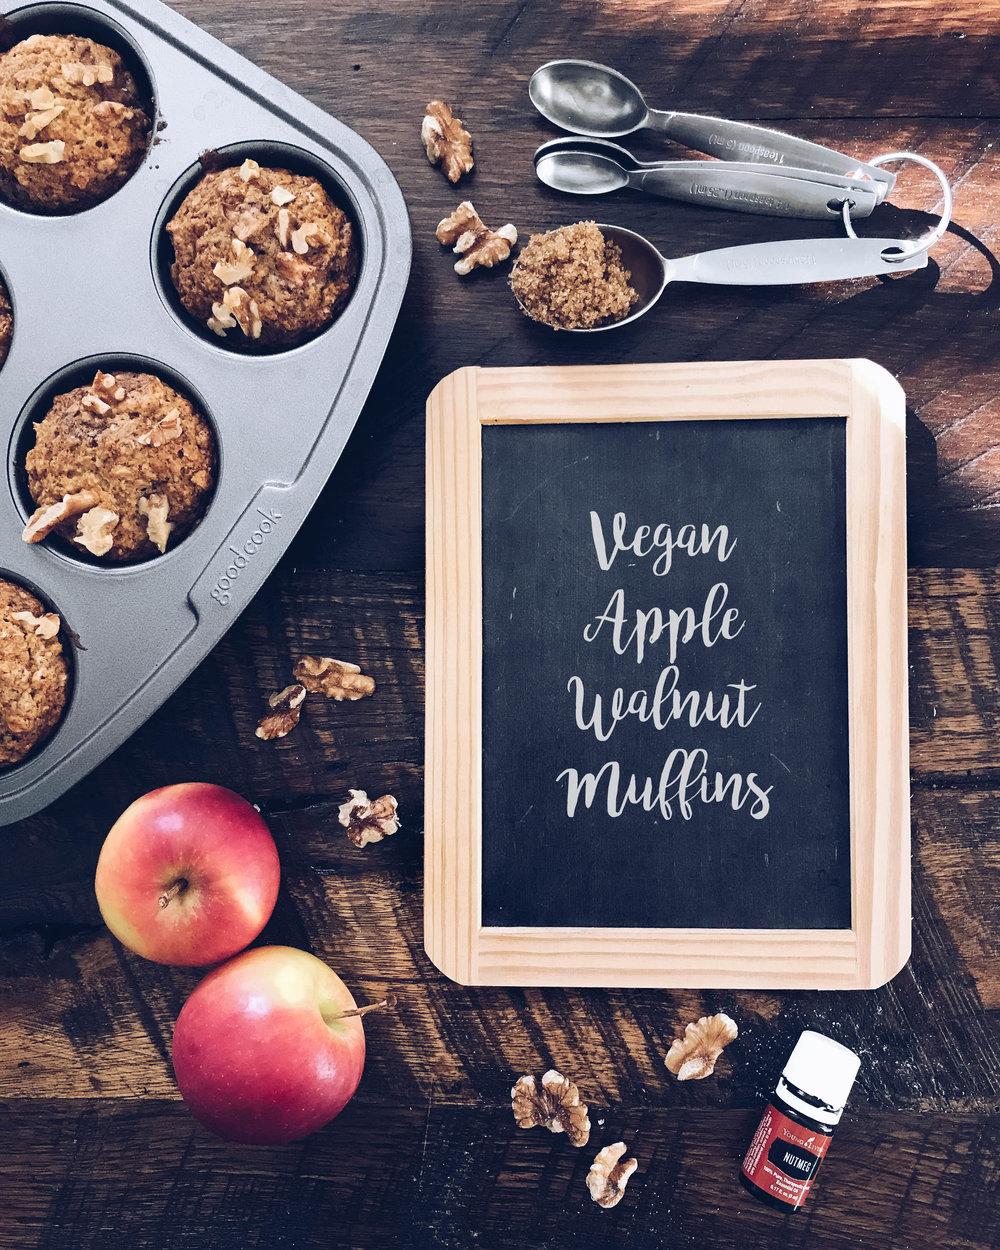 Vegan Apple Walnut Muffins Recipe